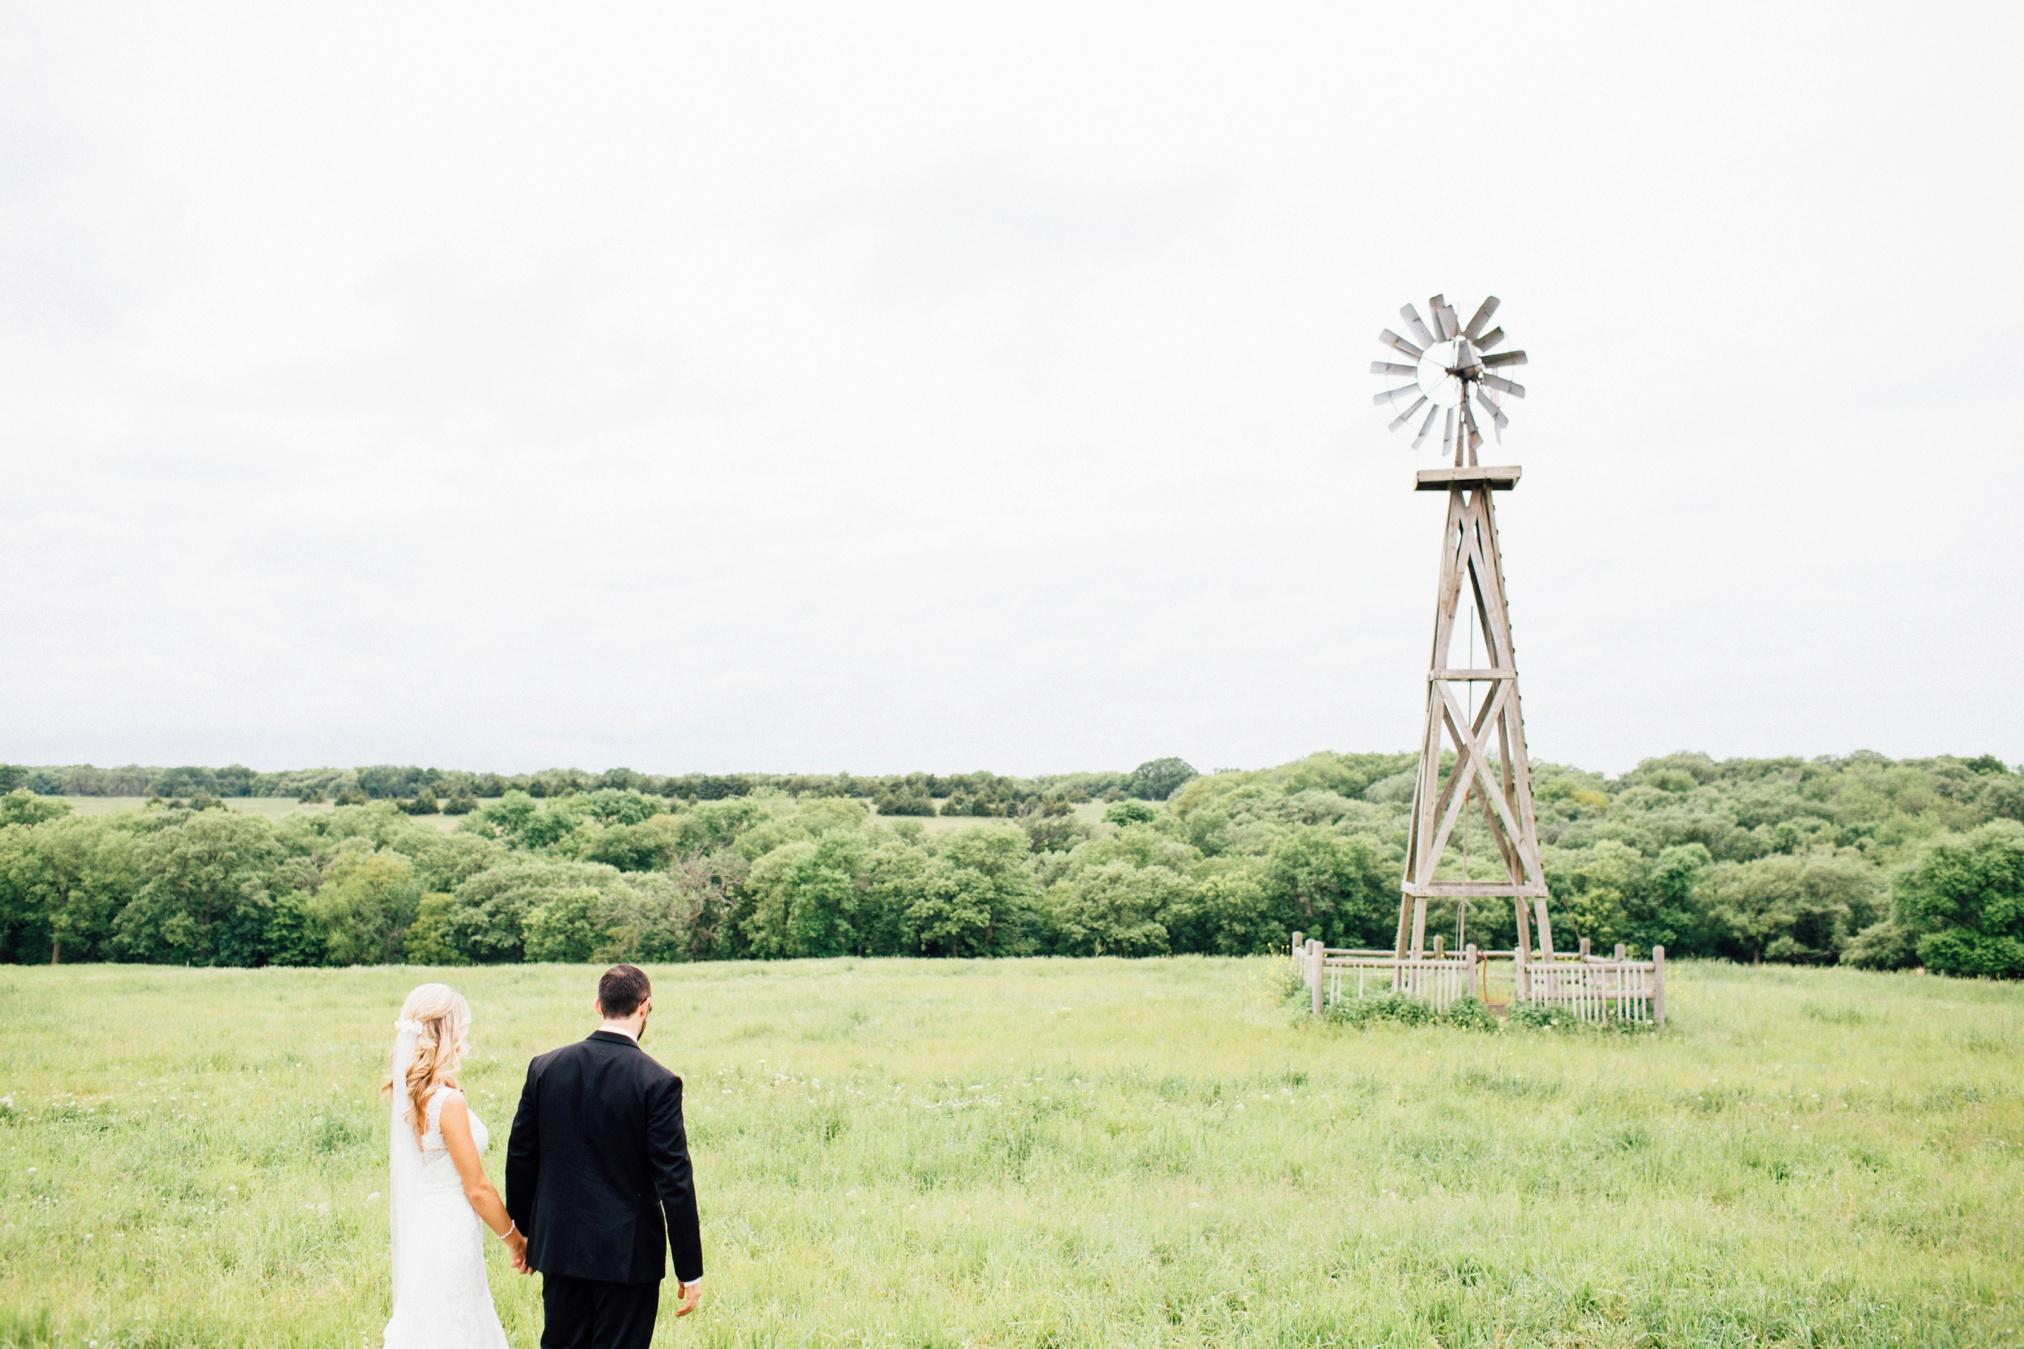 schmid_wedding-647.jpg